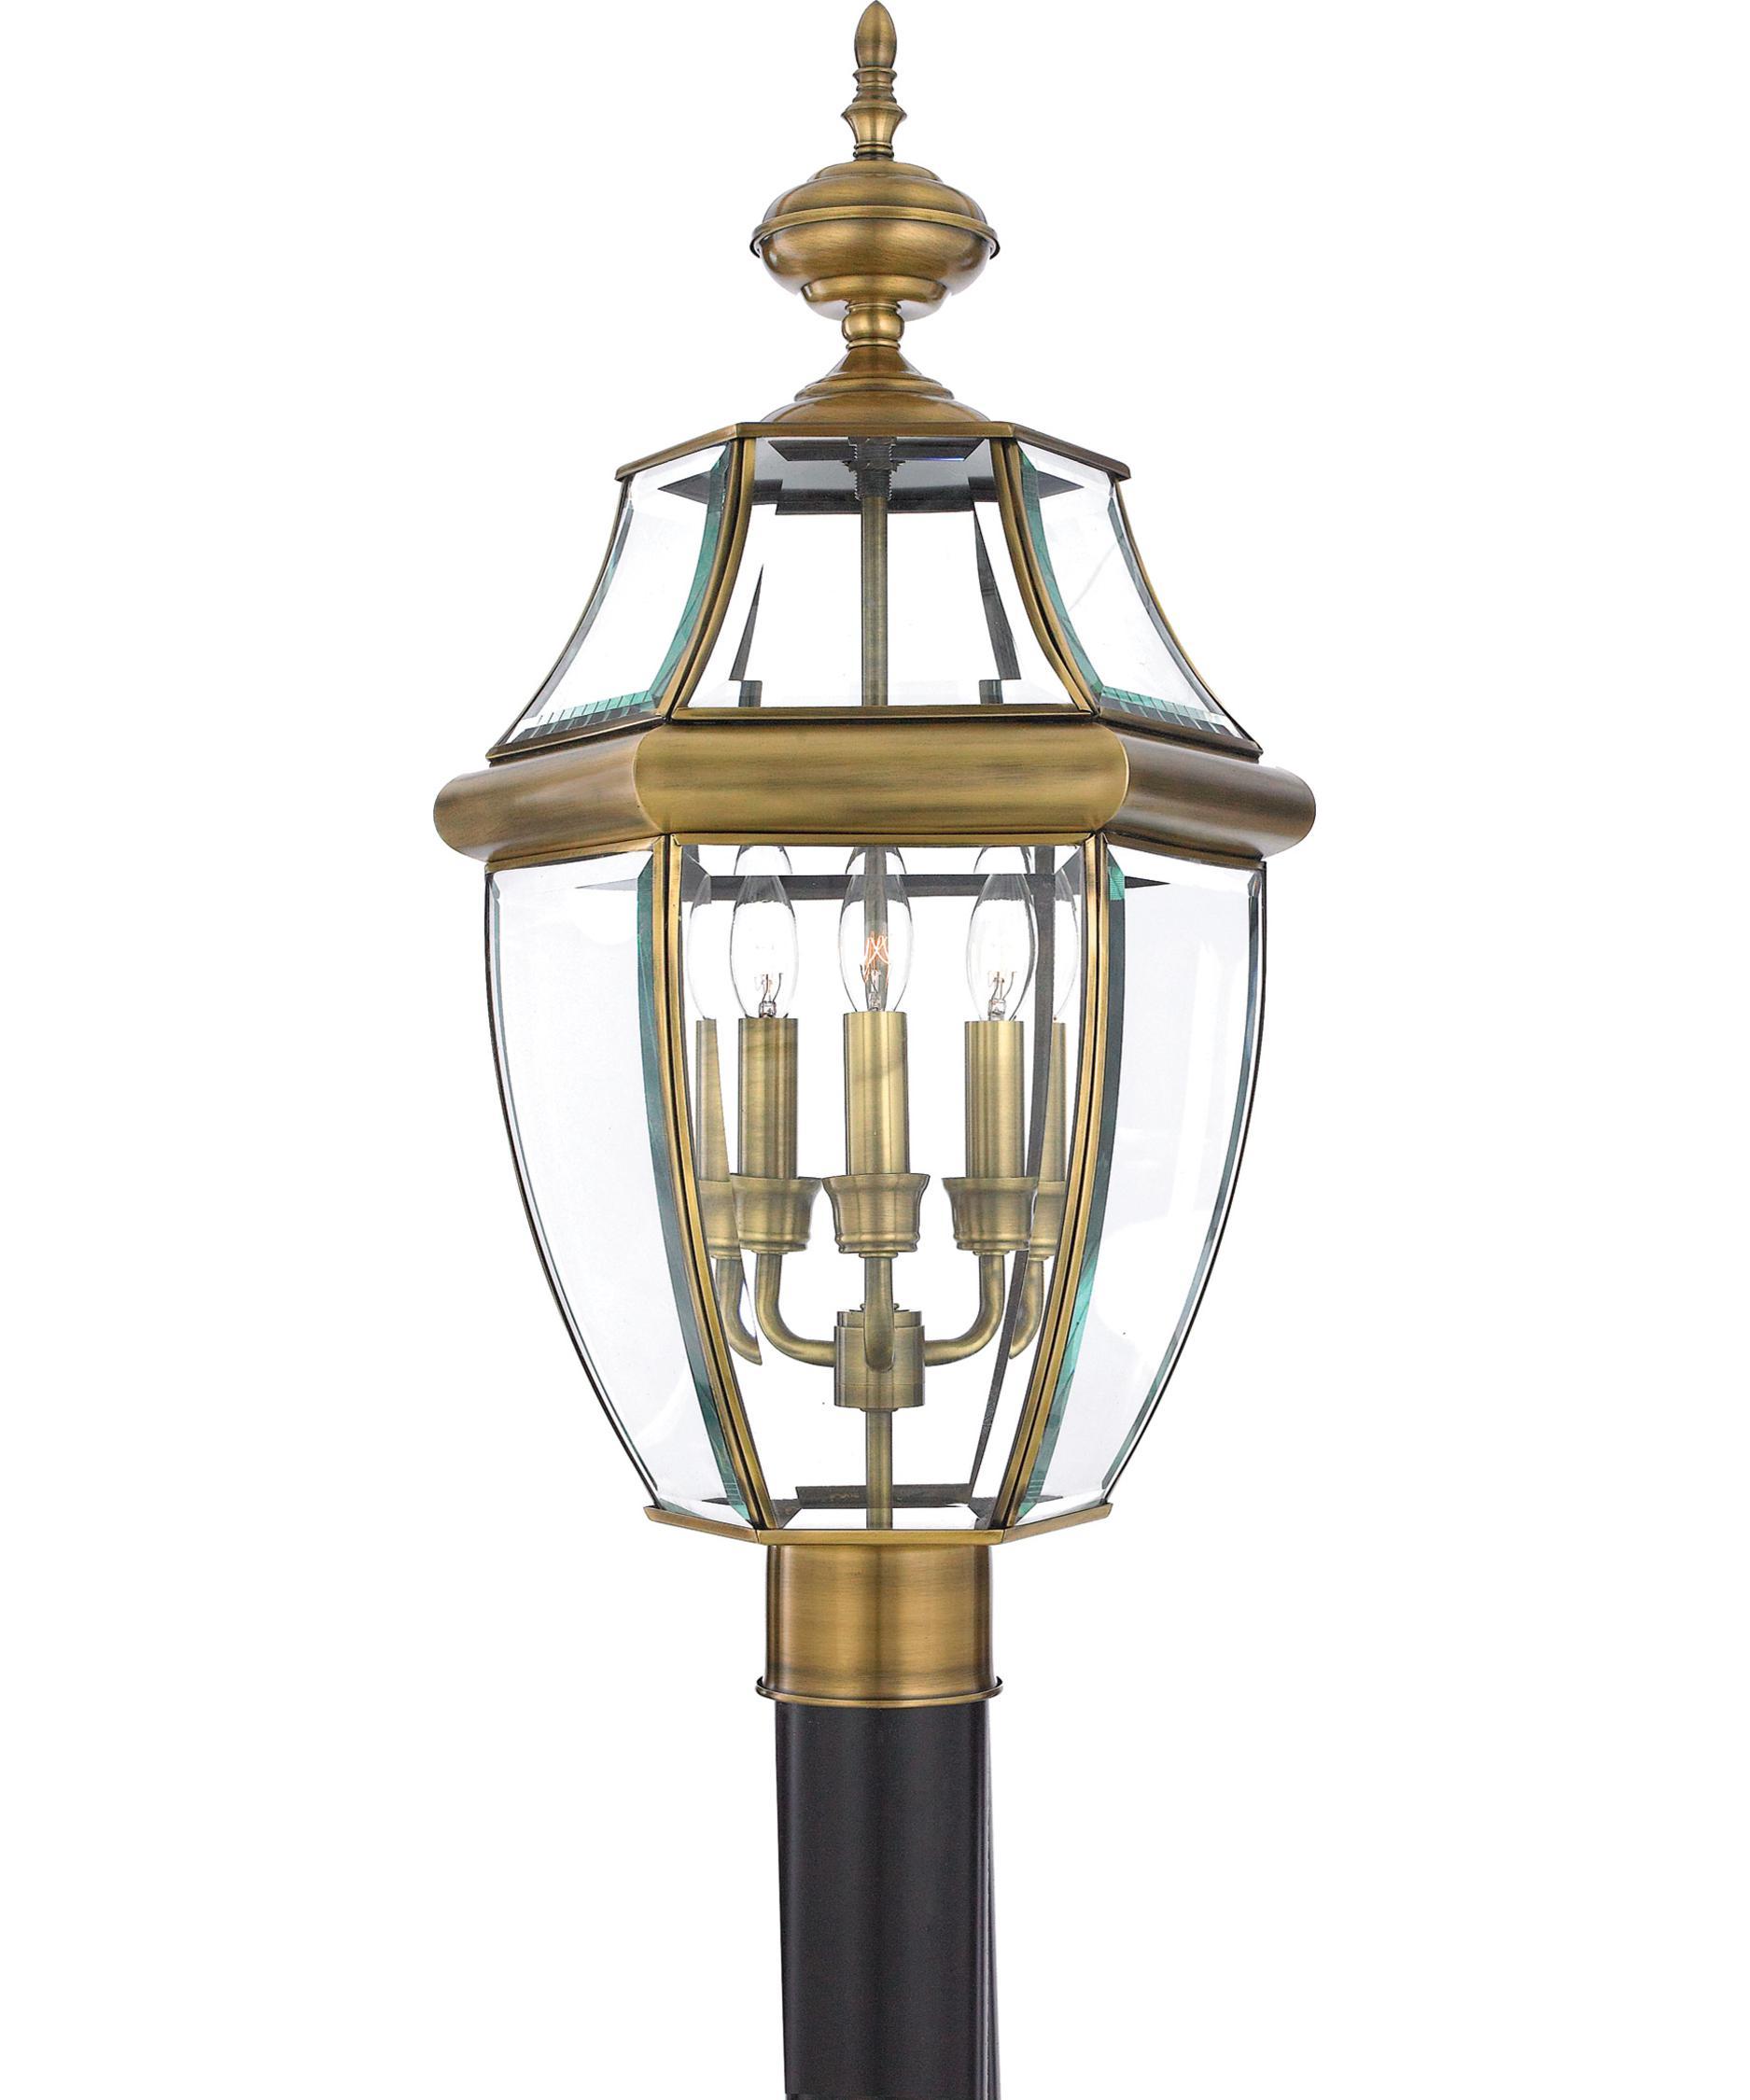 Quoizel Newbury 3 Light Outdoor Post Lamp | Capitol ...